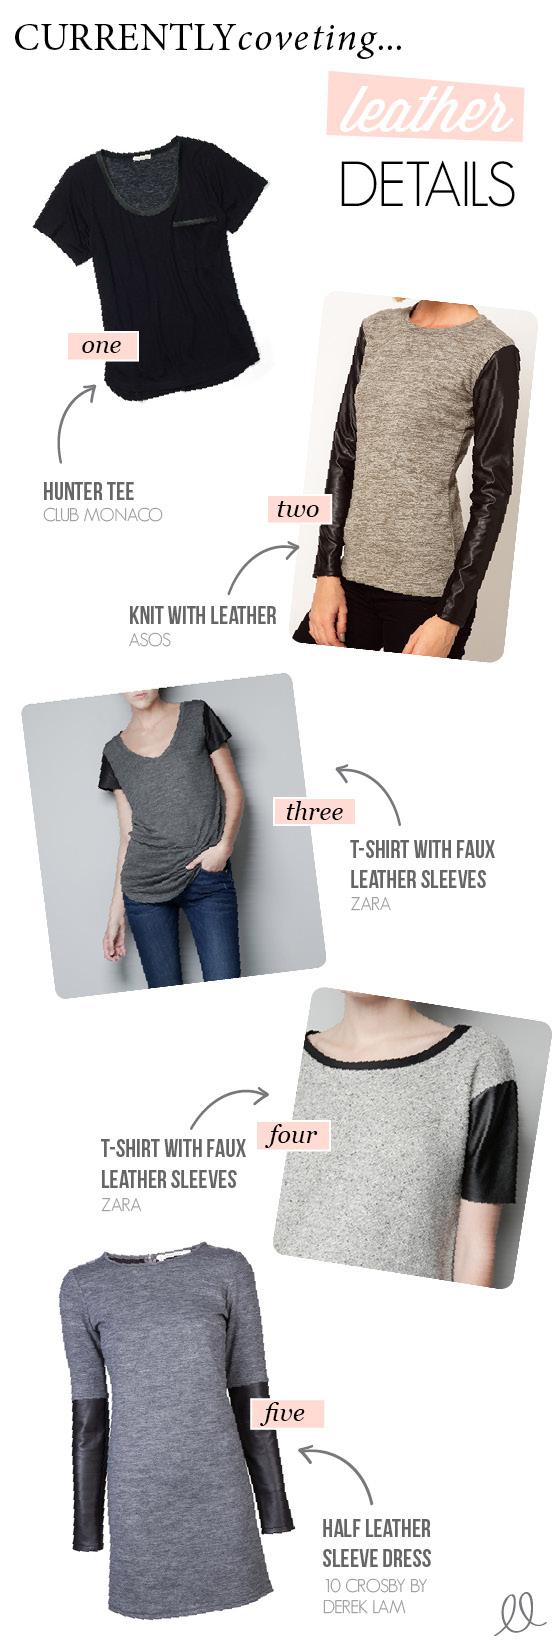 trend alert - 2012- leather sleeves